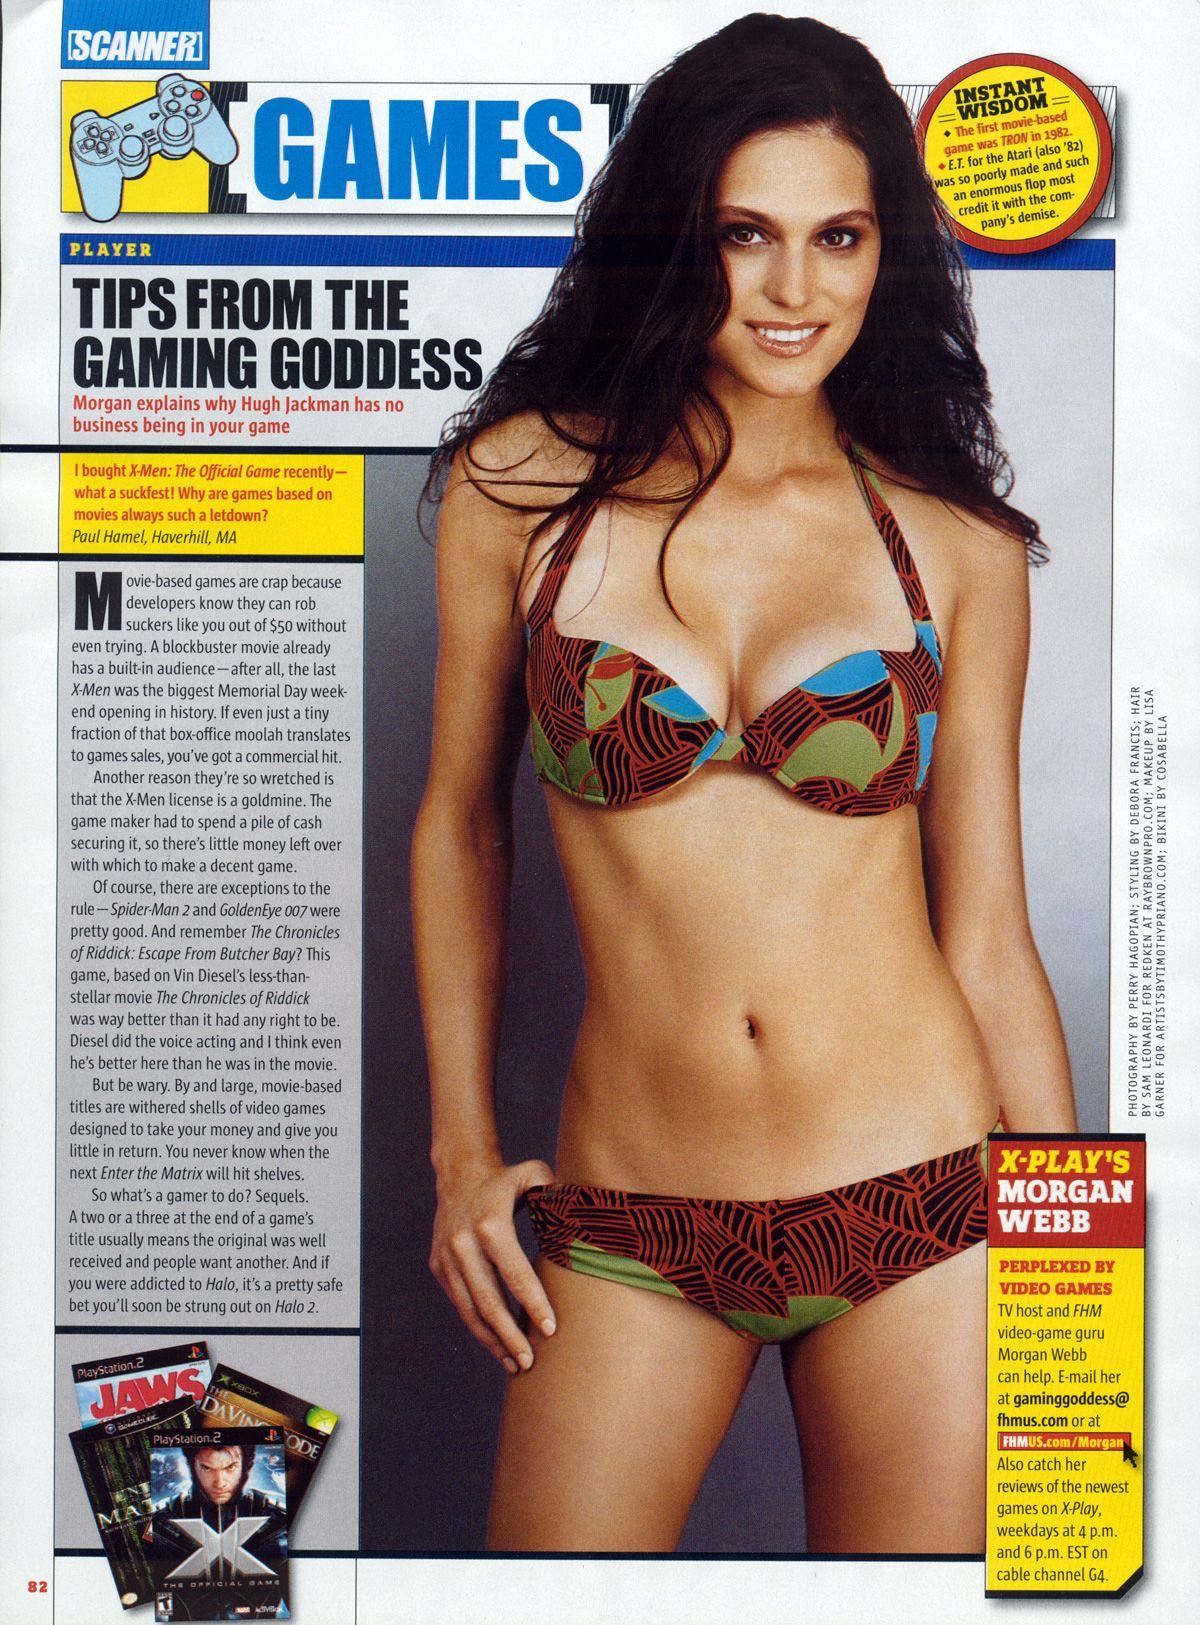 Morgan webb bikini